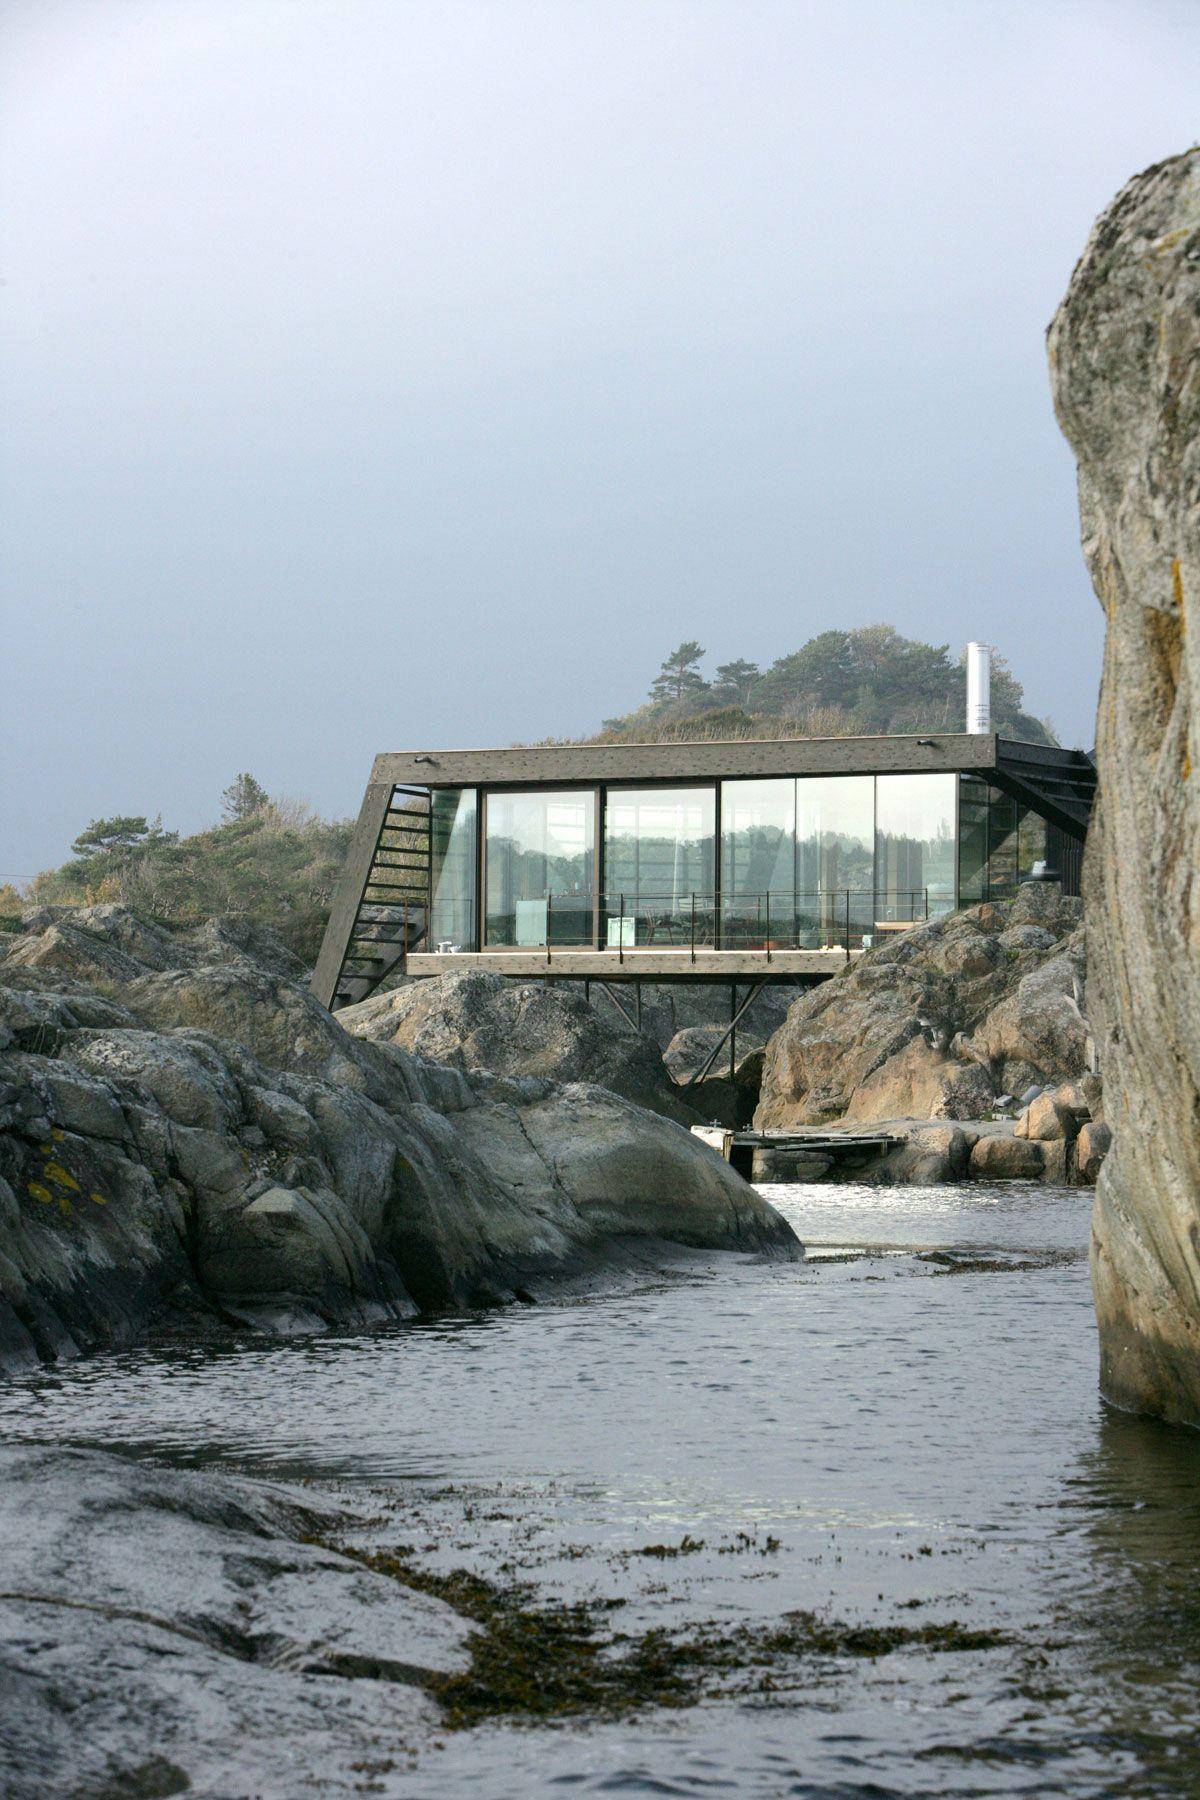 Lille Arøya holiday home built in rocks